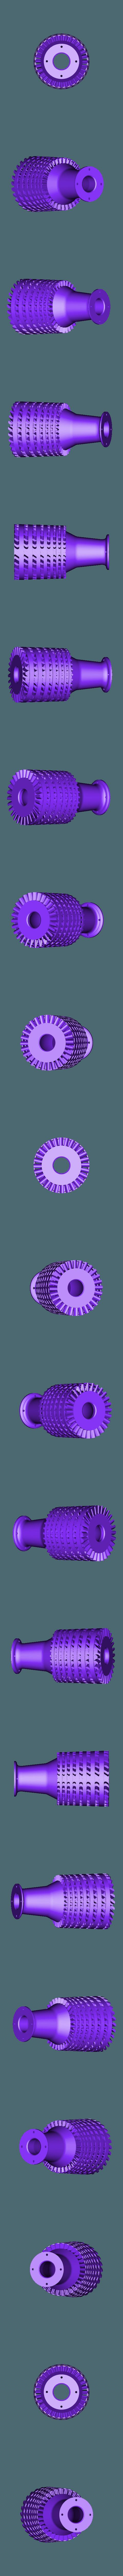 HPC-Rotor901ws.stl Download free STL file Jet Engine; Geared Turbofan (GTF), Modified Parts • 3D print template, konchan77